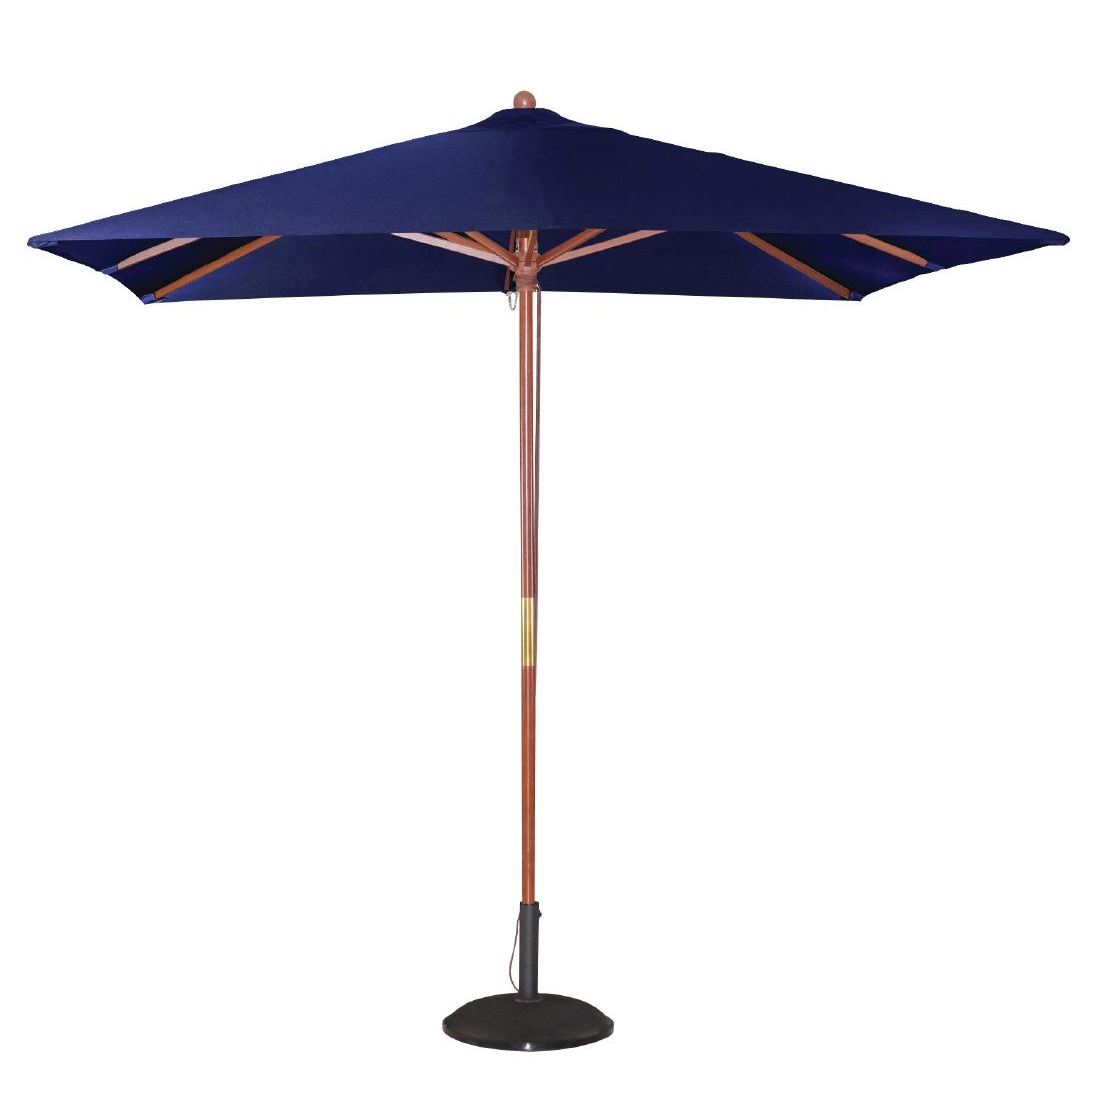 Parasol carré 2,5m bleu marine